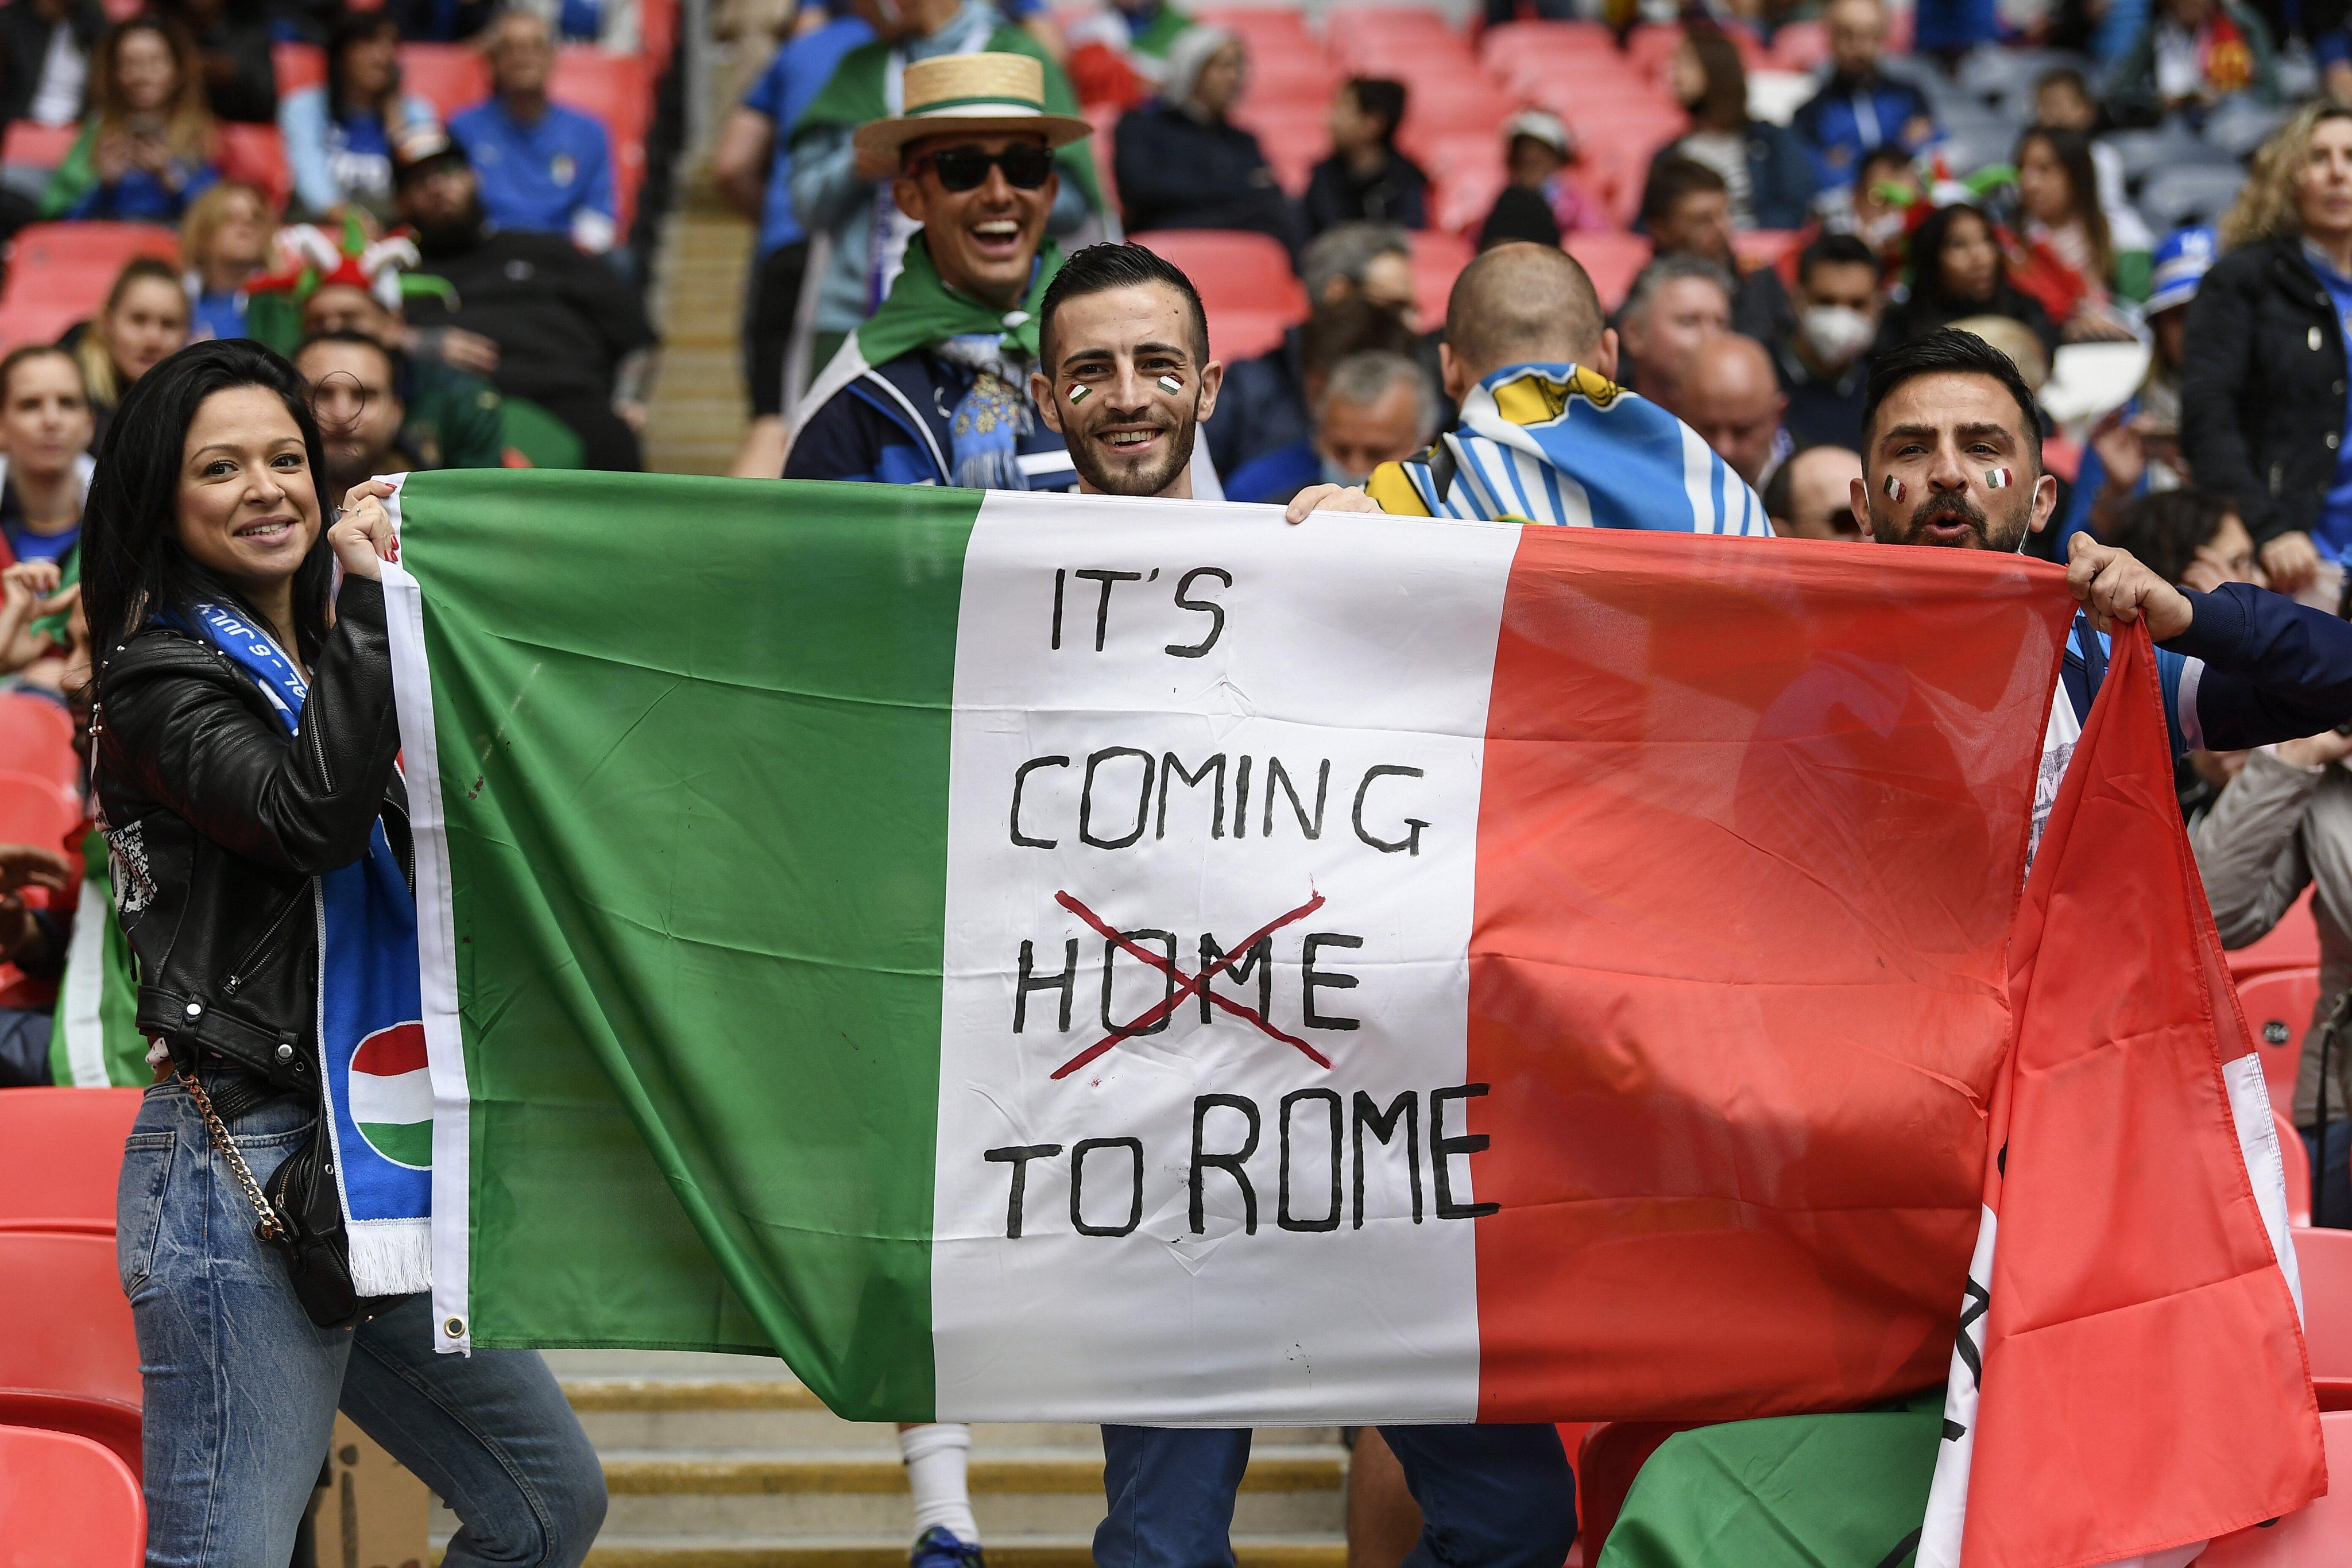 EURO 2020 Final:  England - Italy E5okrYcX0AYhMby?format=jpg&name=4096x4096